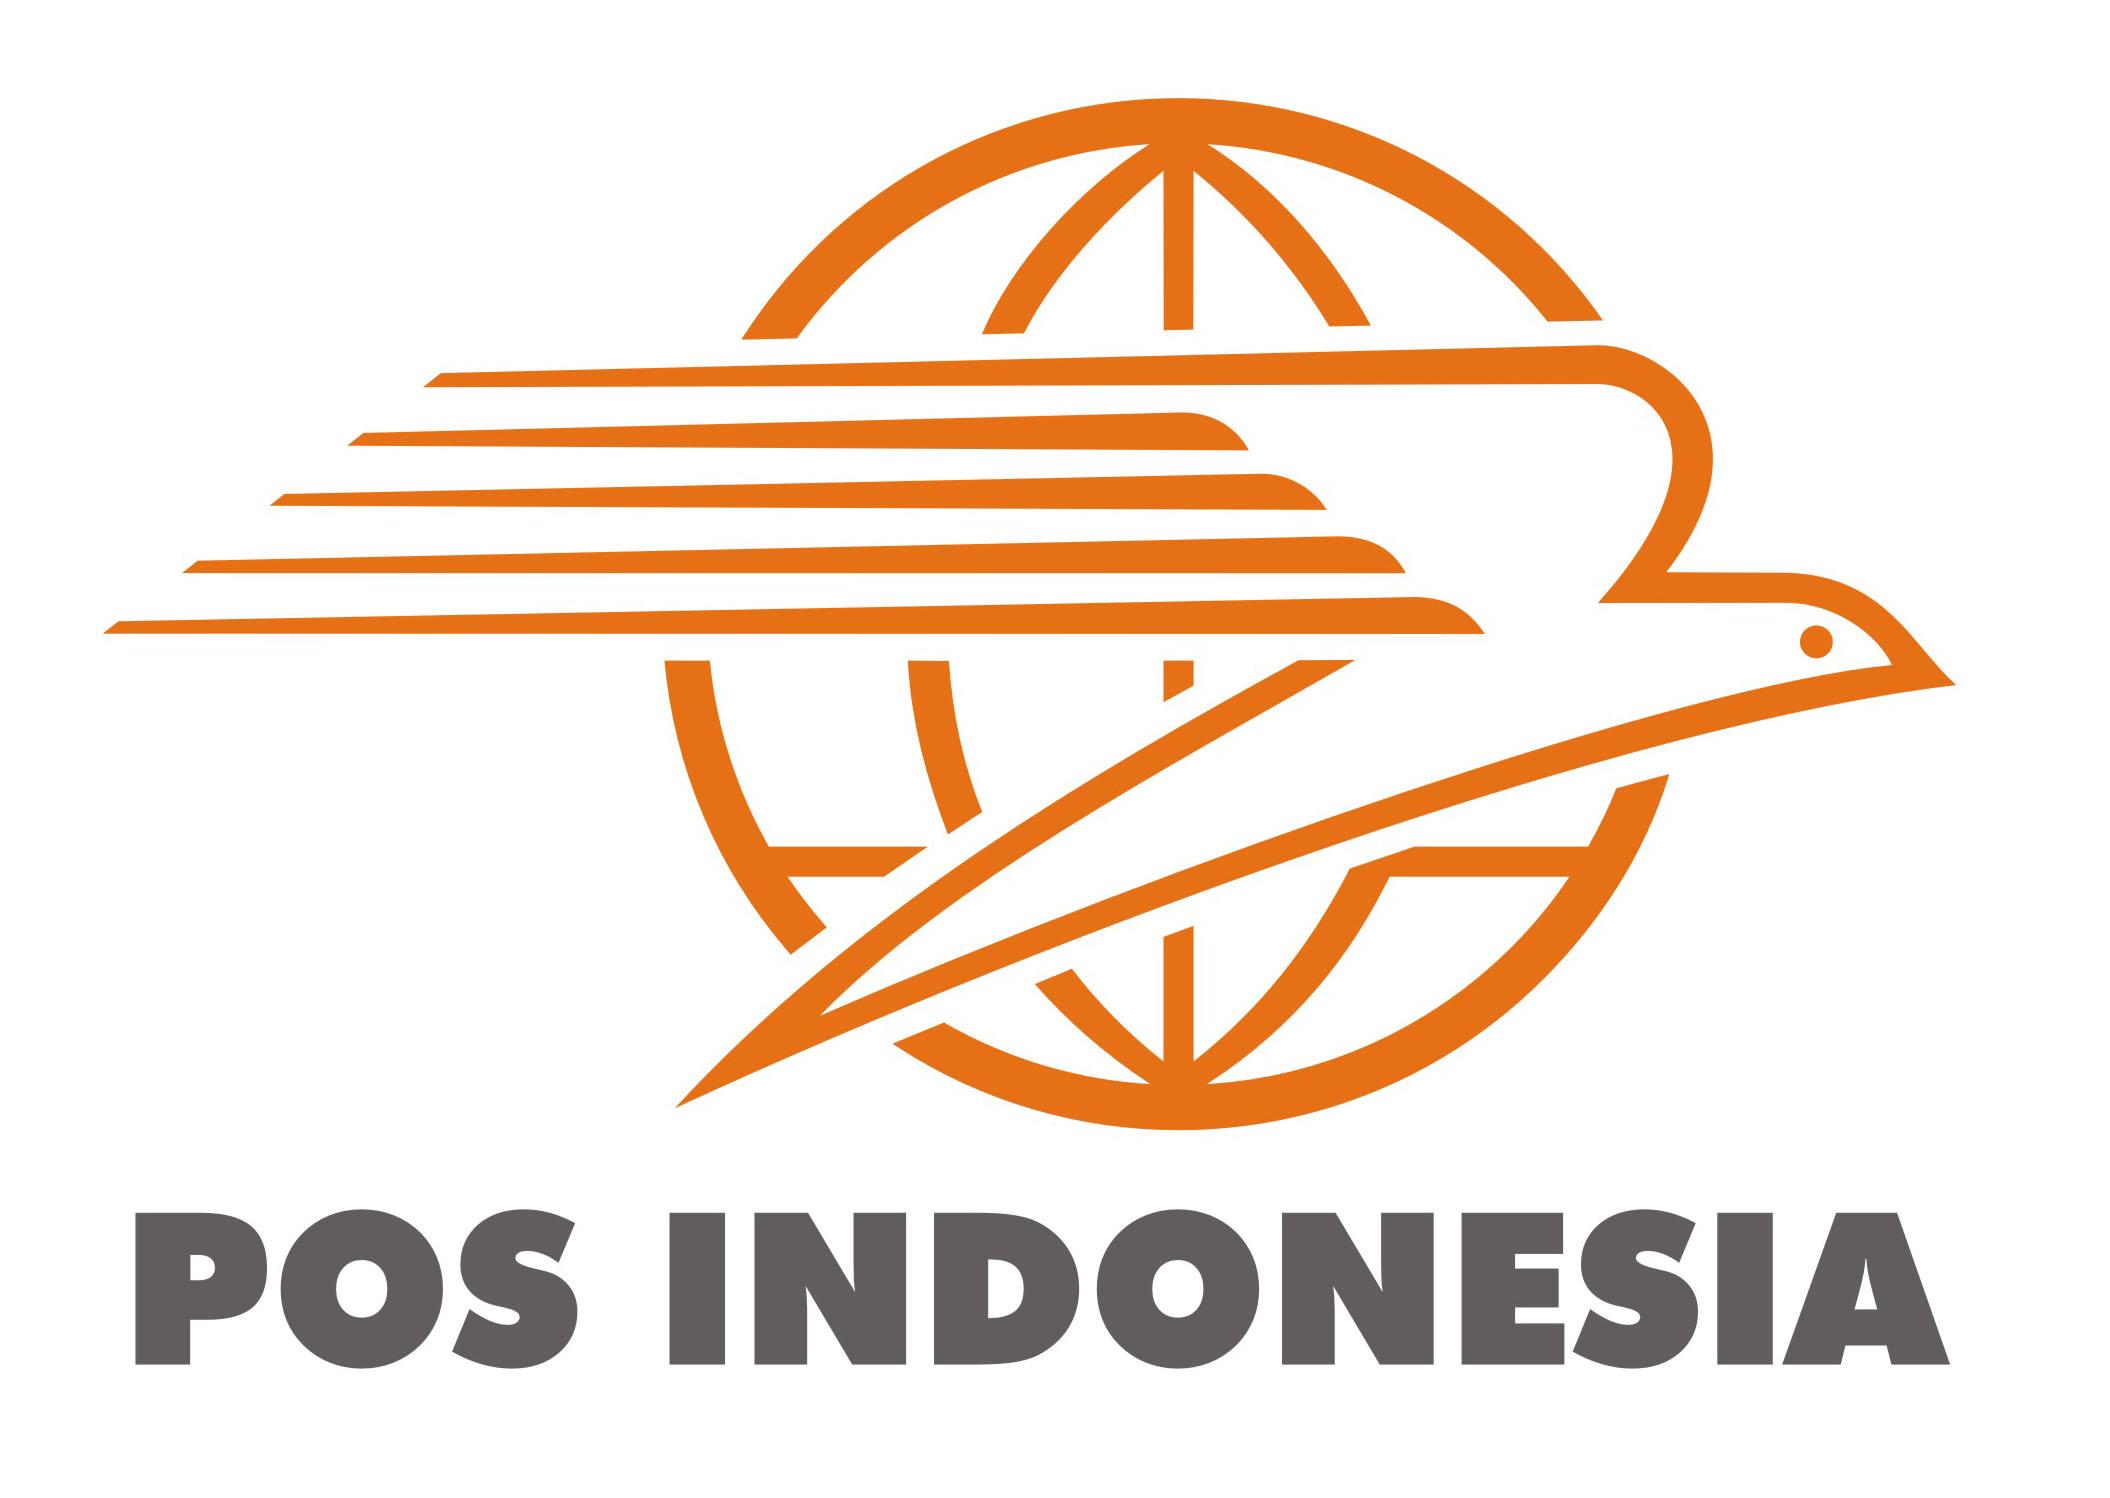 Logo Pos Indonesia 2012